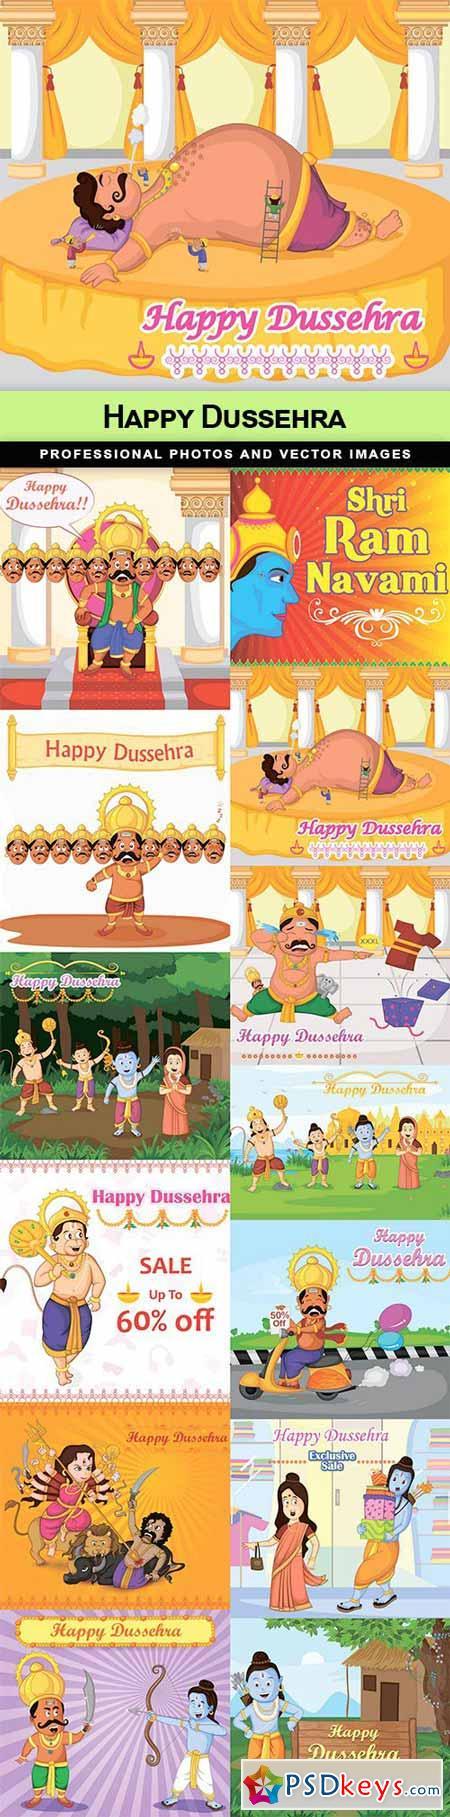 Happy Dussehra - 13 EPS